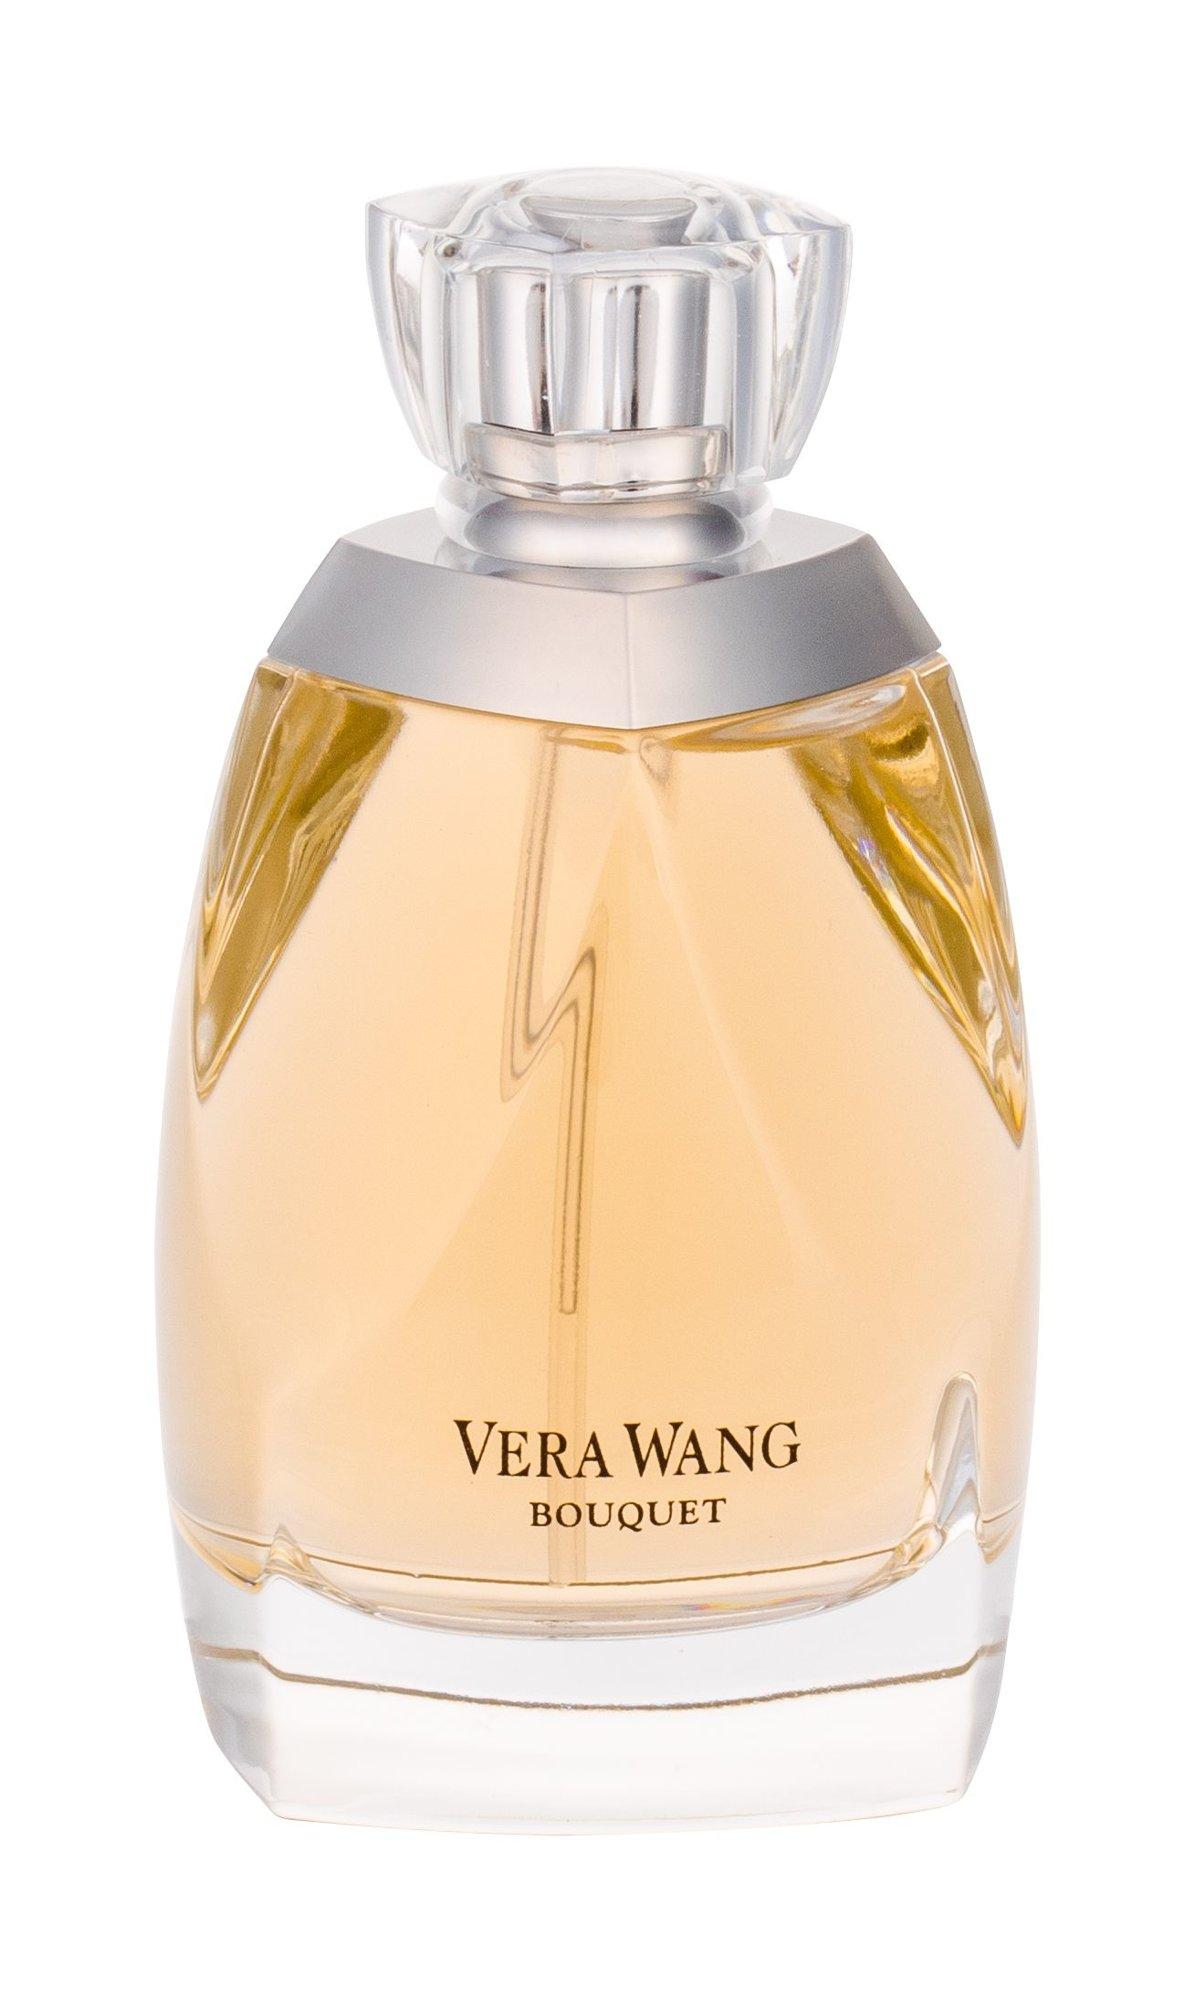 Vera Wang Bouquet Eau de Parfum 100ml